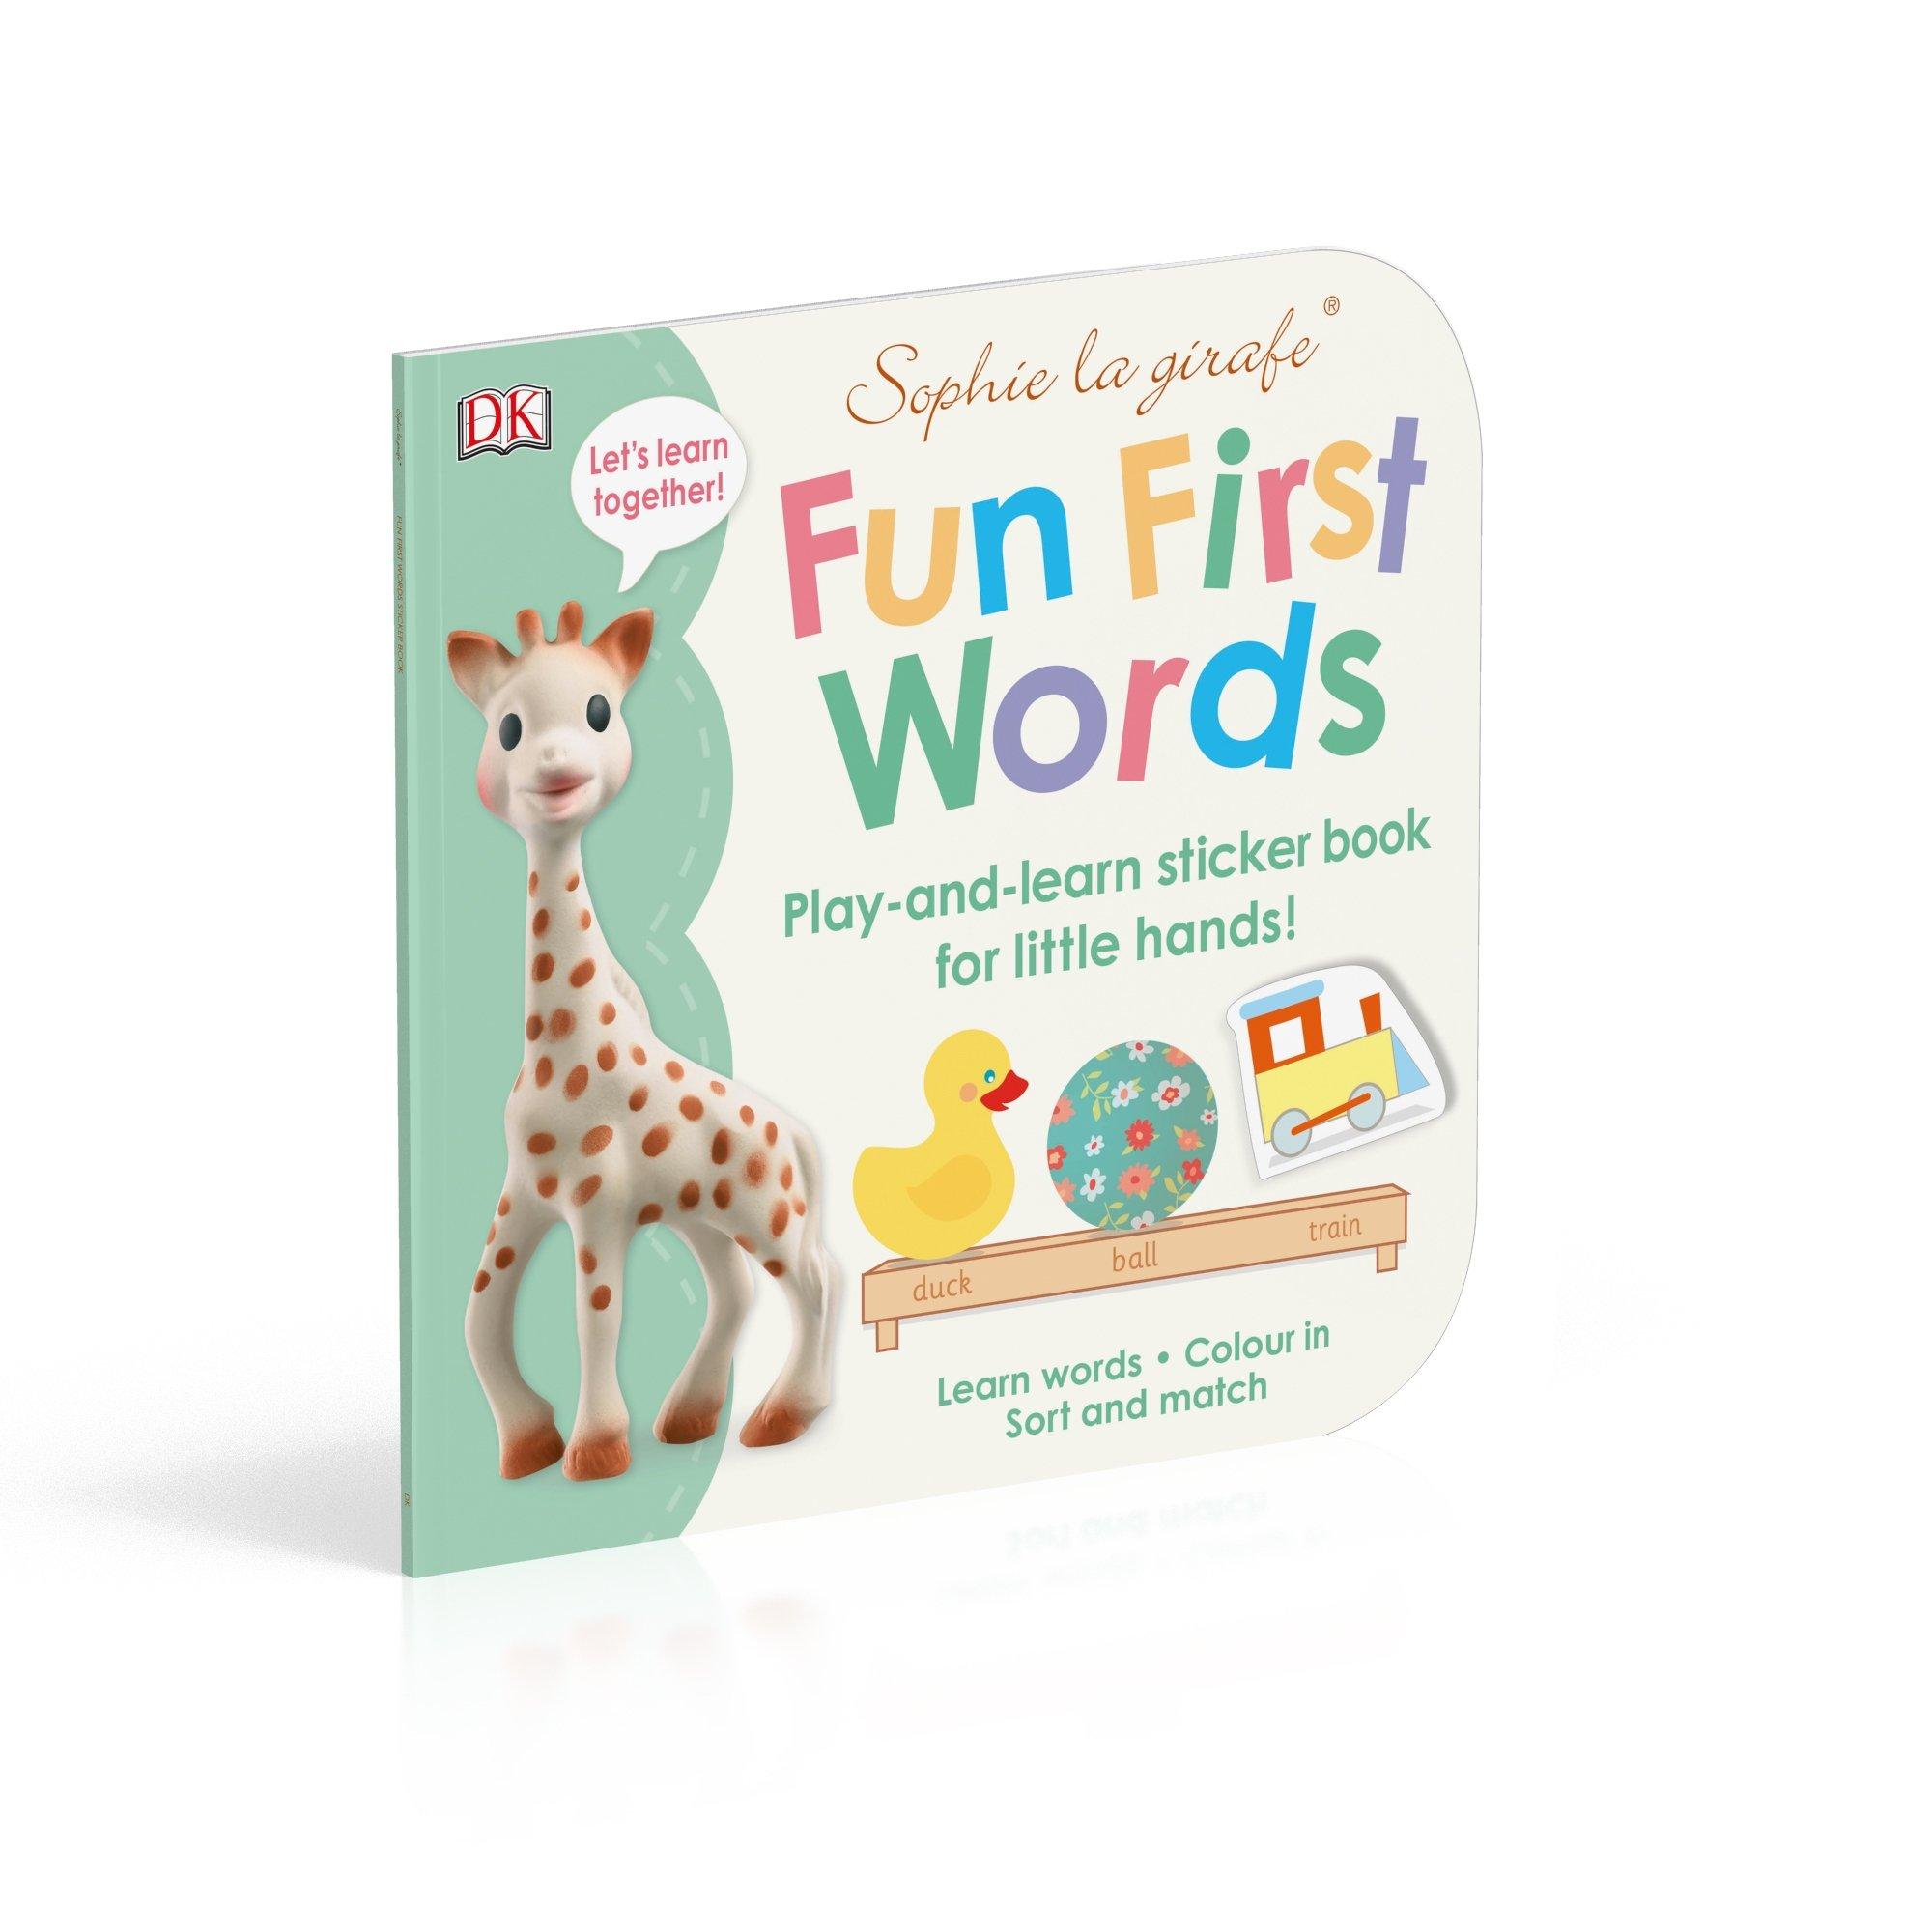 sophie la girafe fun first words play